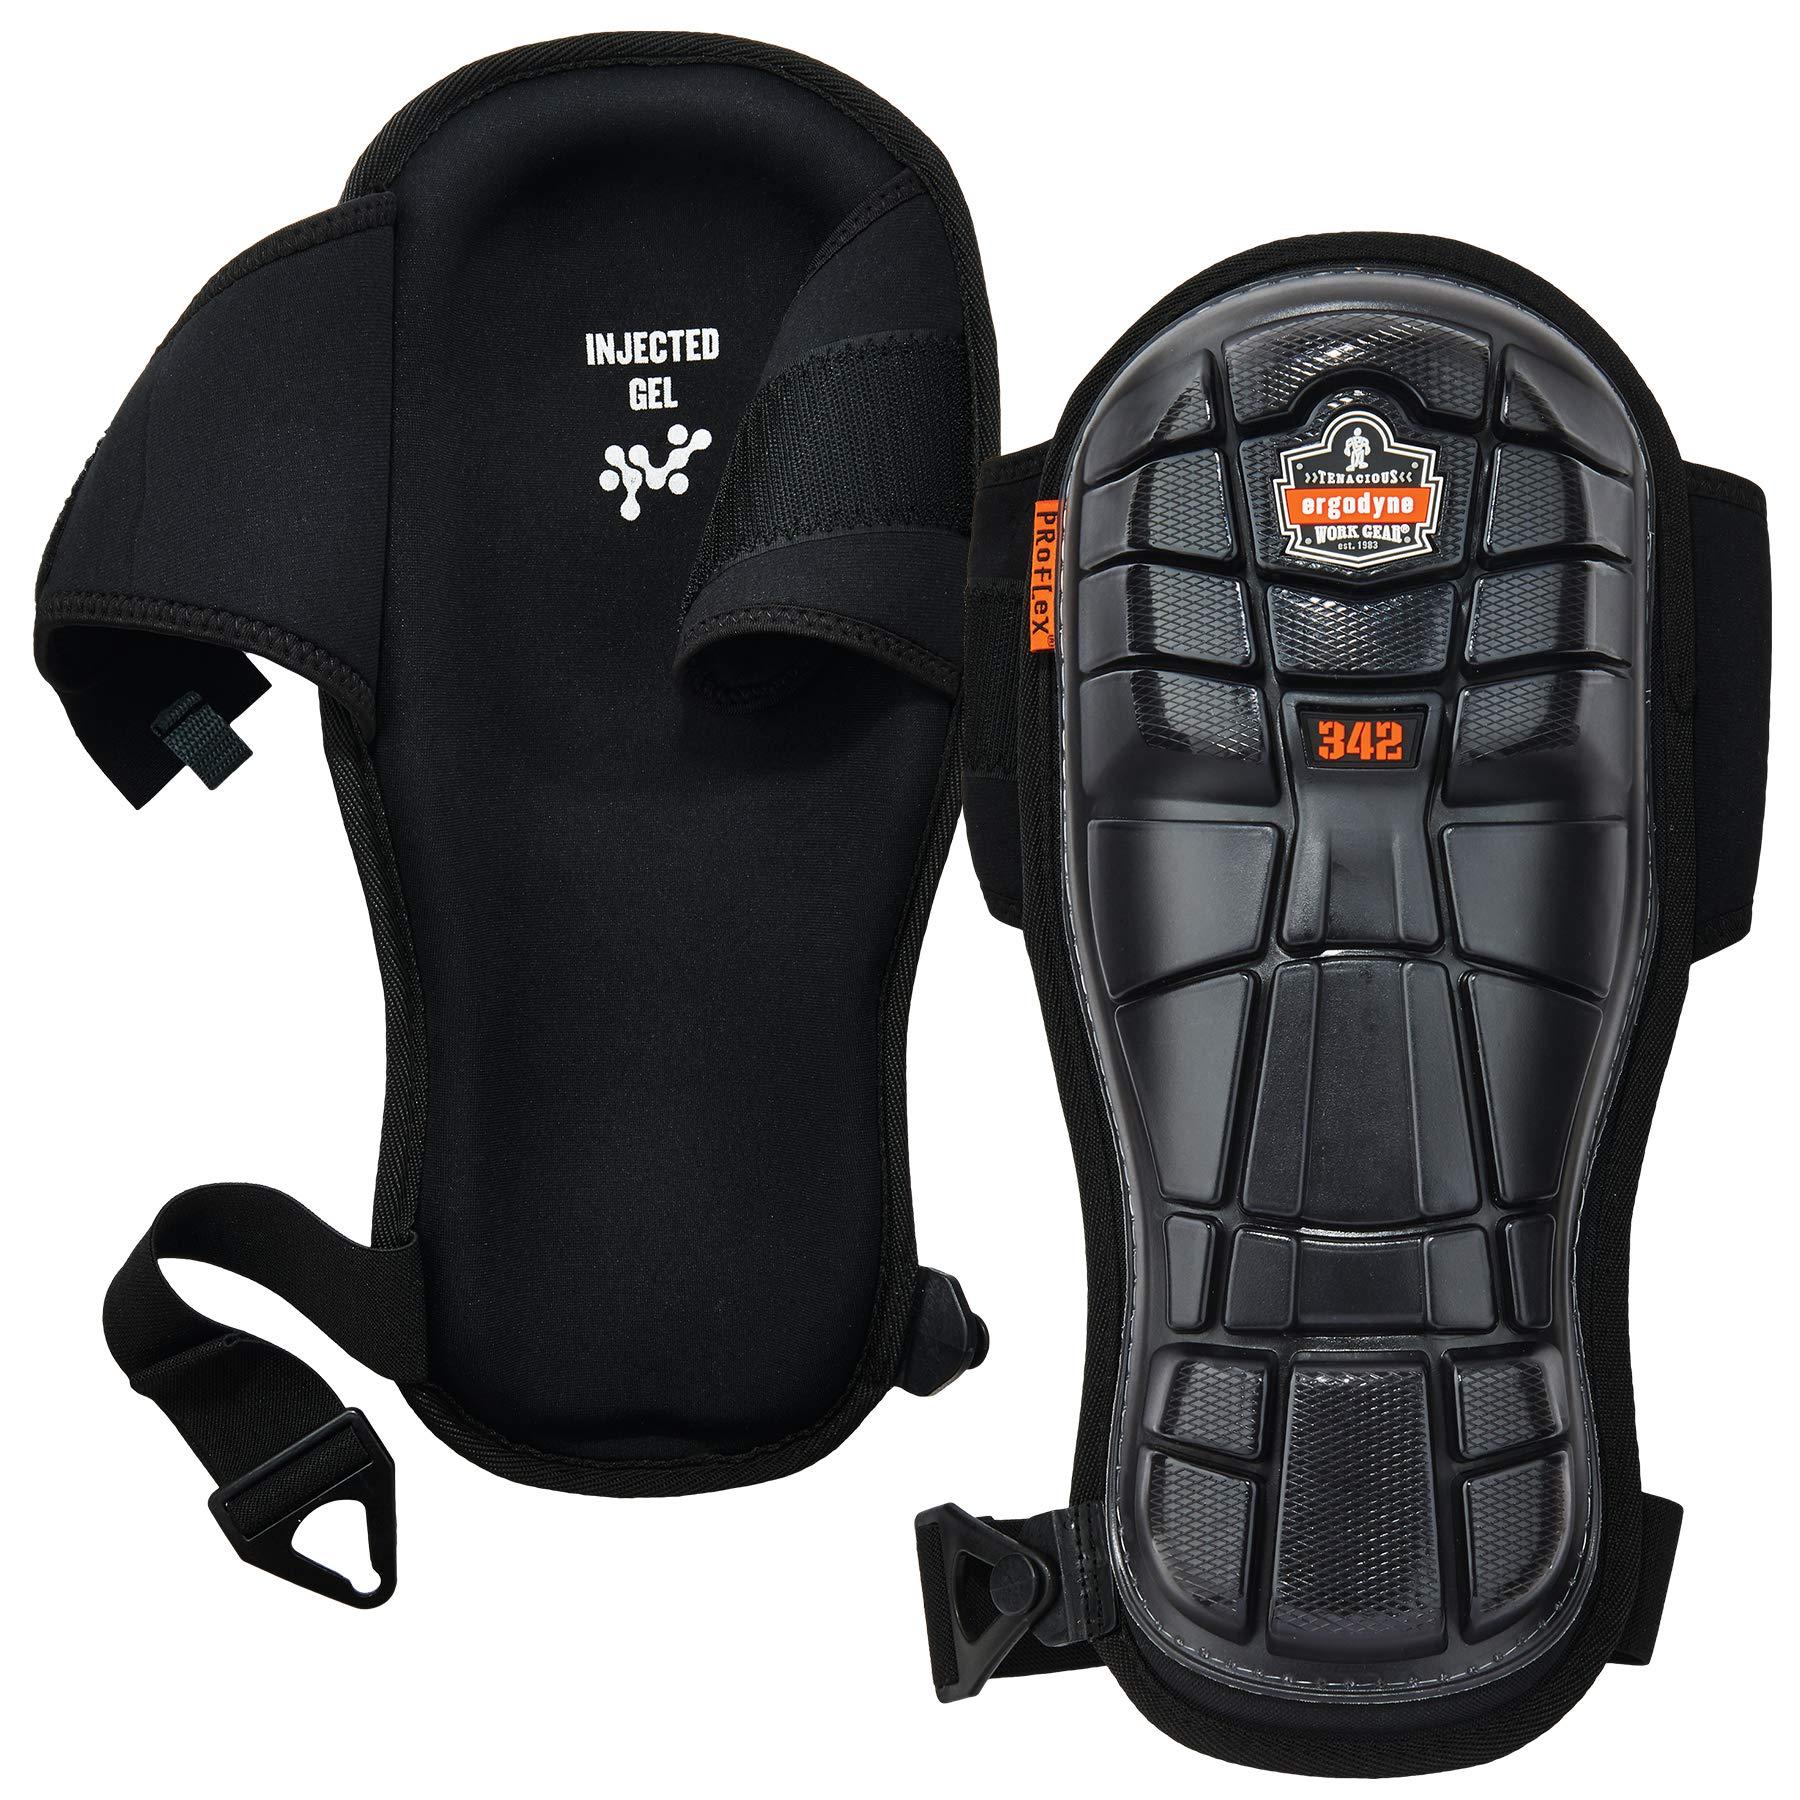 Ergodyne ProFlex 342 Professional Knee Pads, Protective Extra Long Cap, Injected Gel Padded Technology, Adjustable Straps, Black by Ergodyne